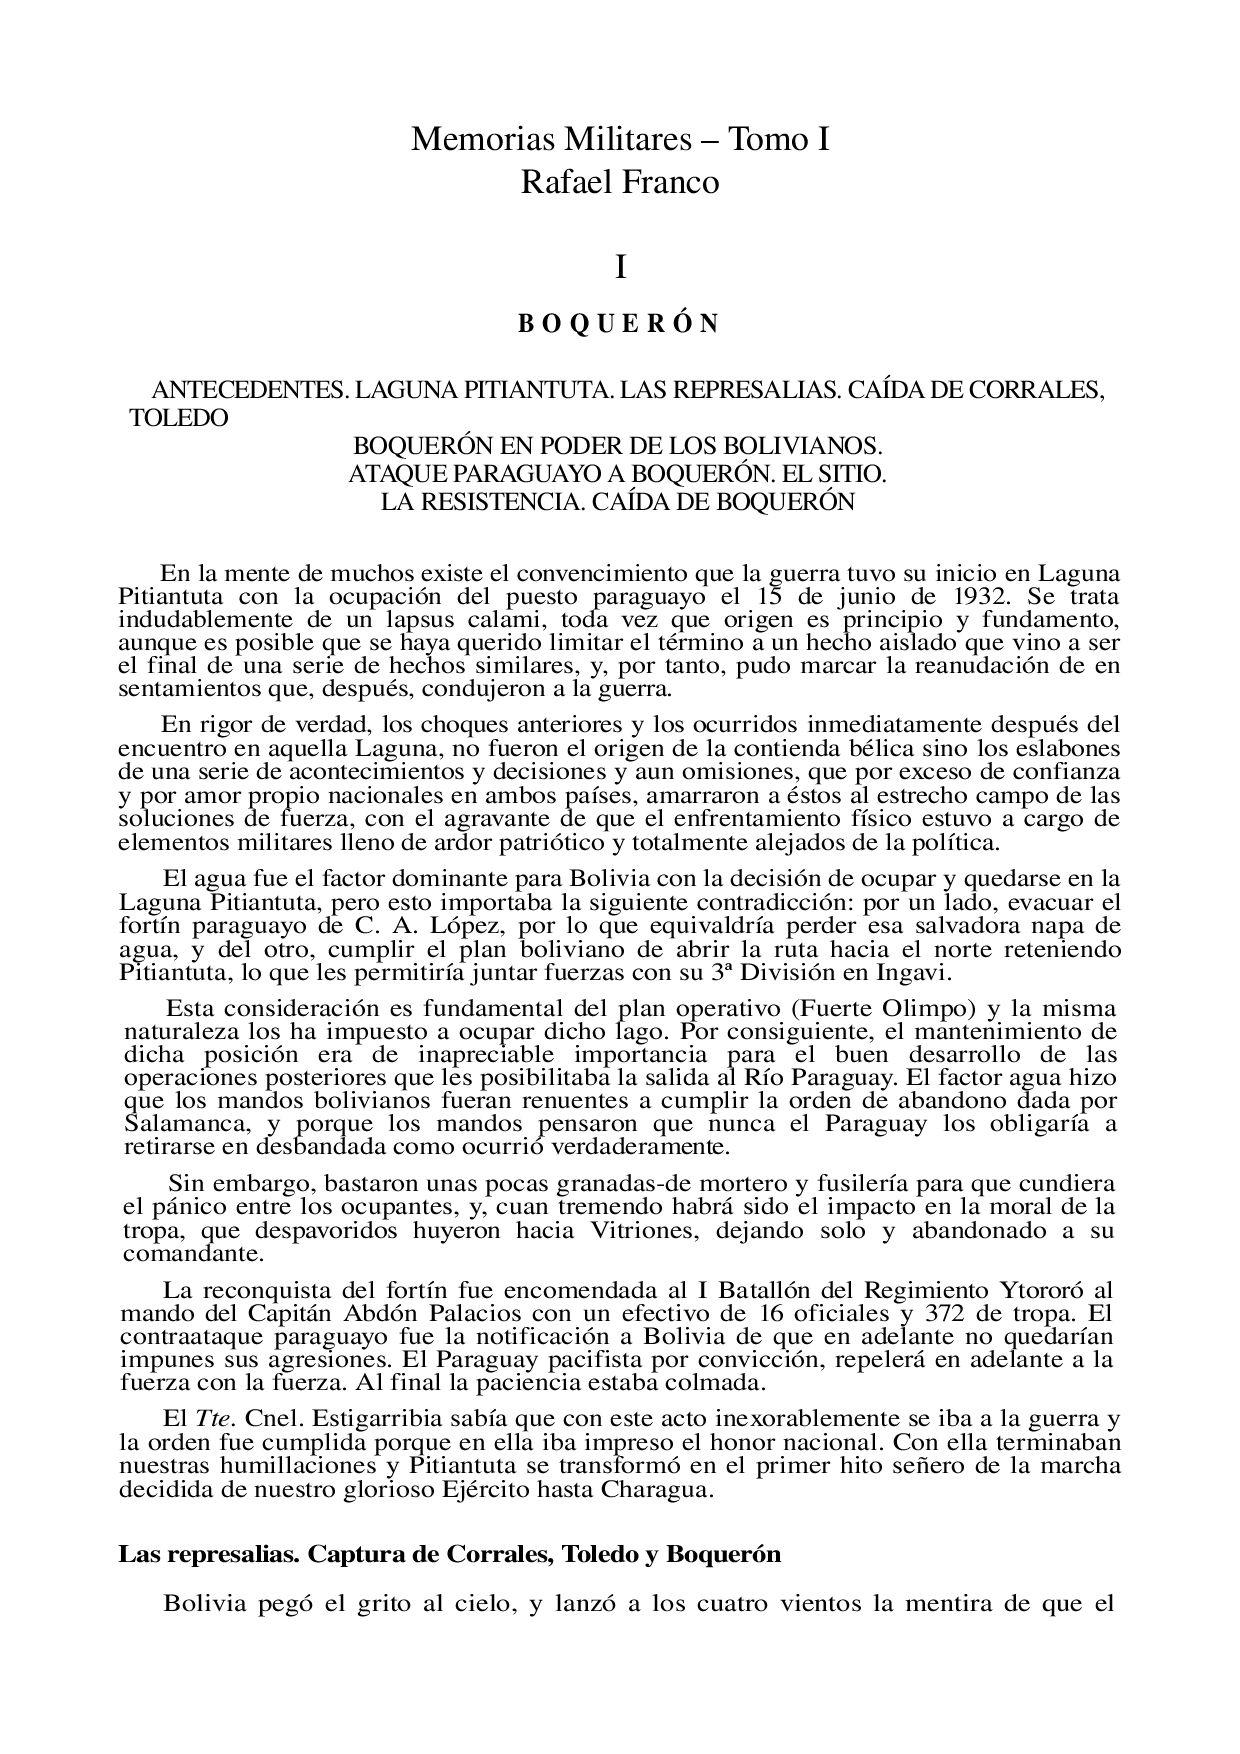 Batalla de Boquerón - Rafael Franco by Ugo Oddone - issuu